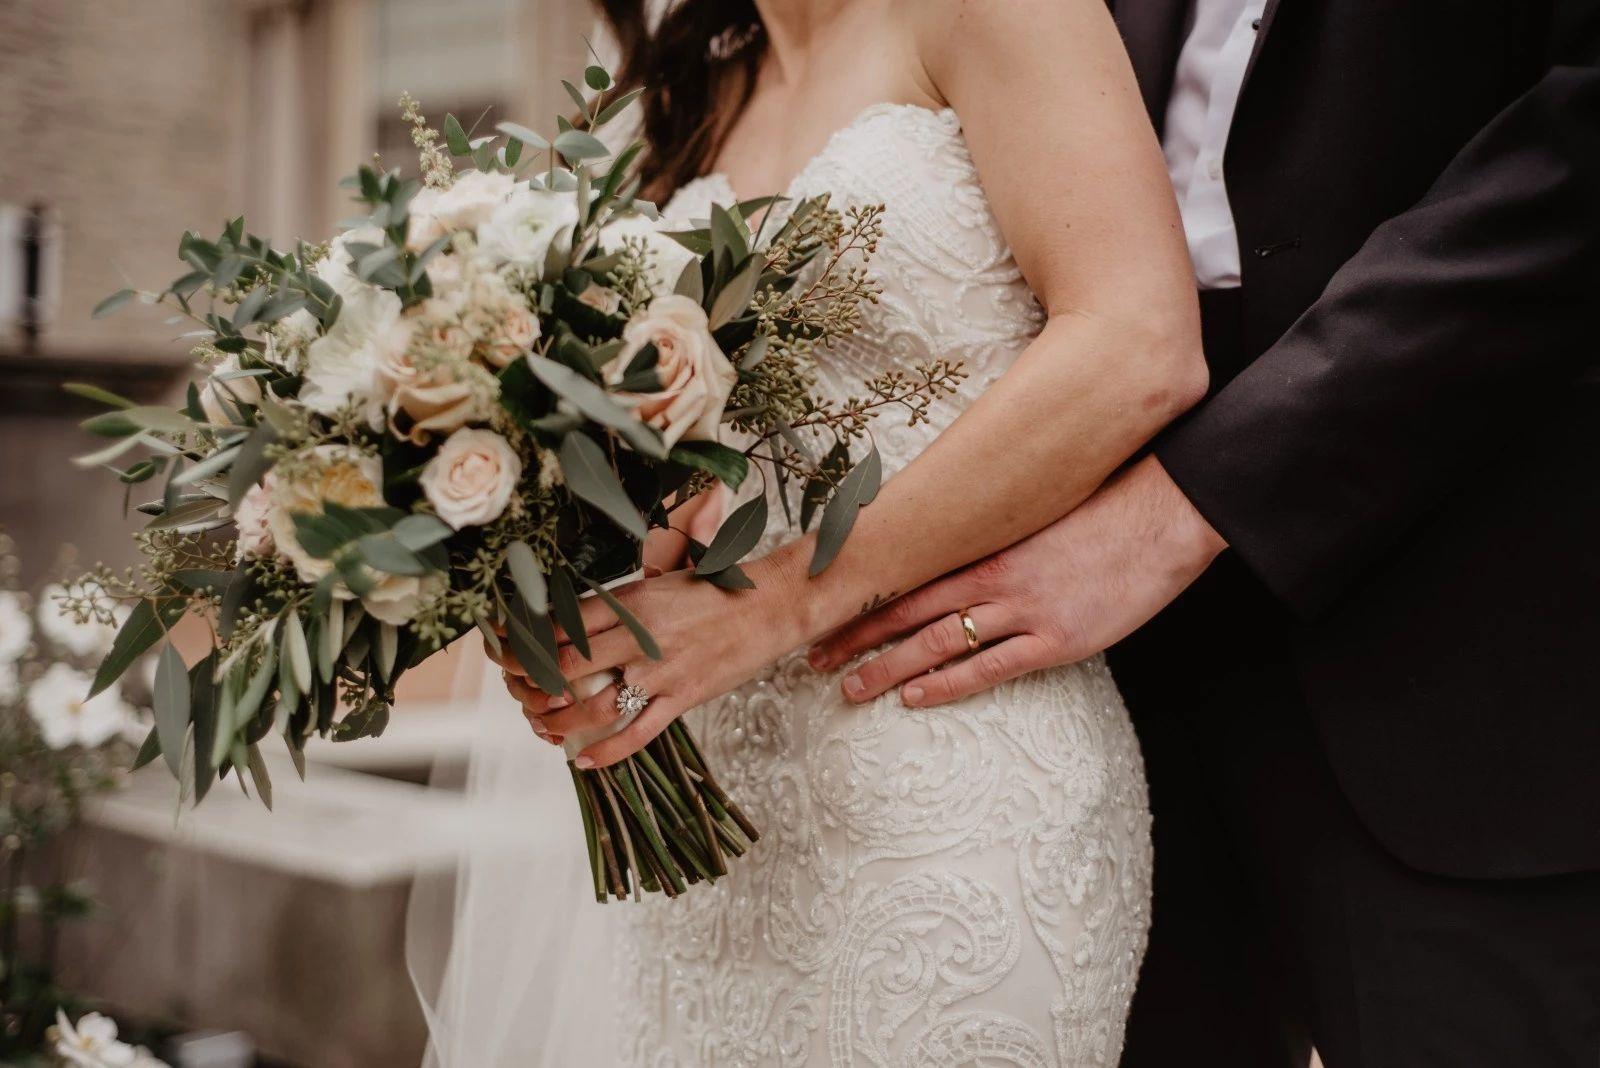 woman-wearing-white-wedding-gown-2253867.jpg